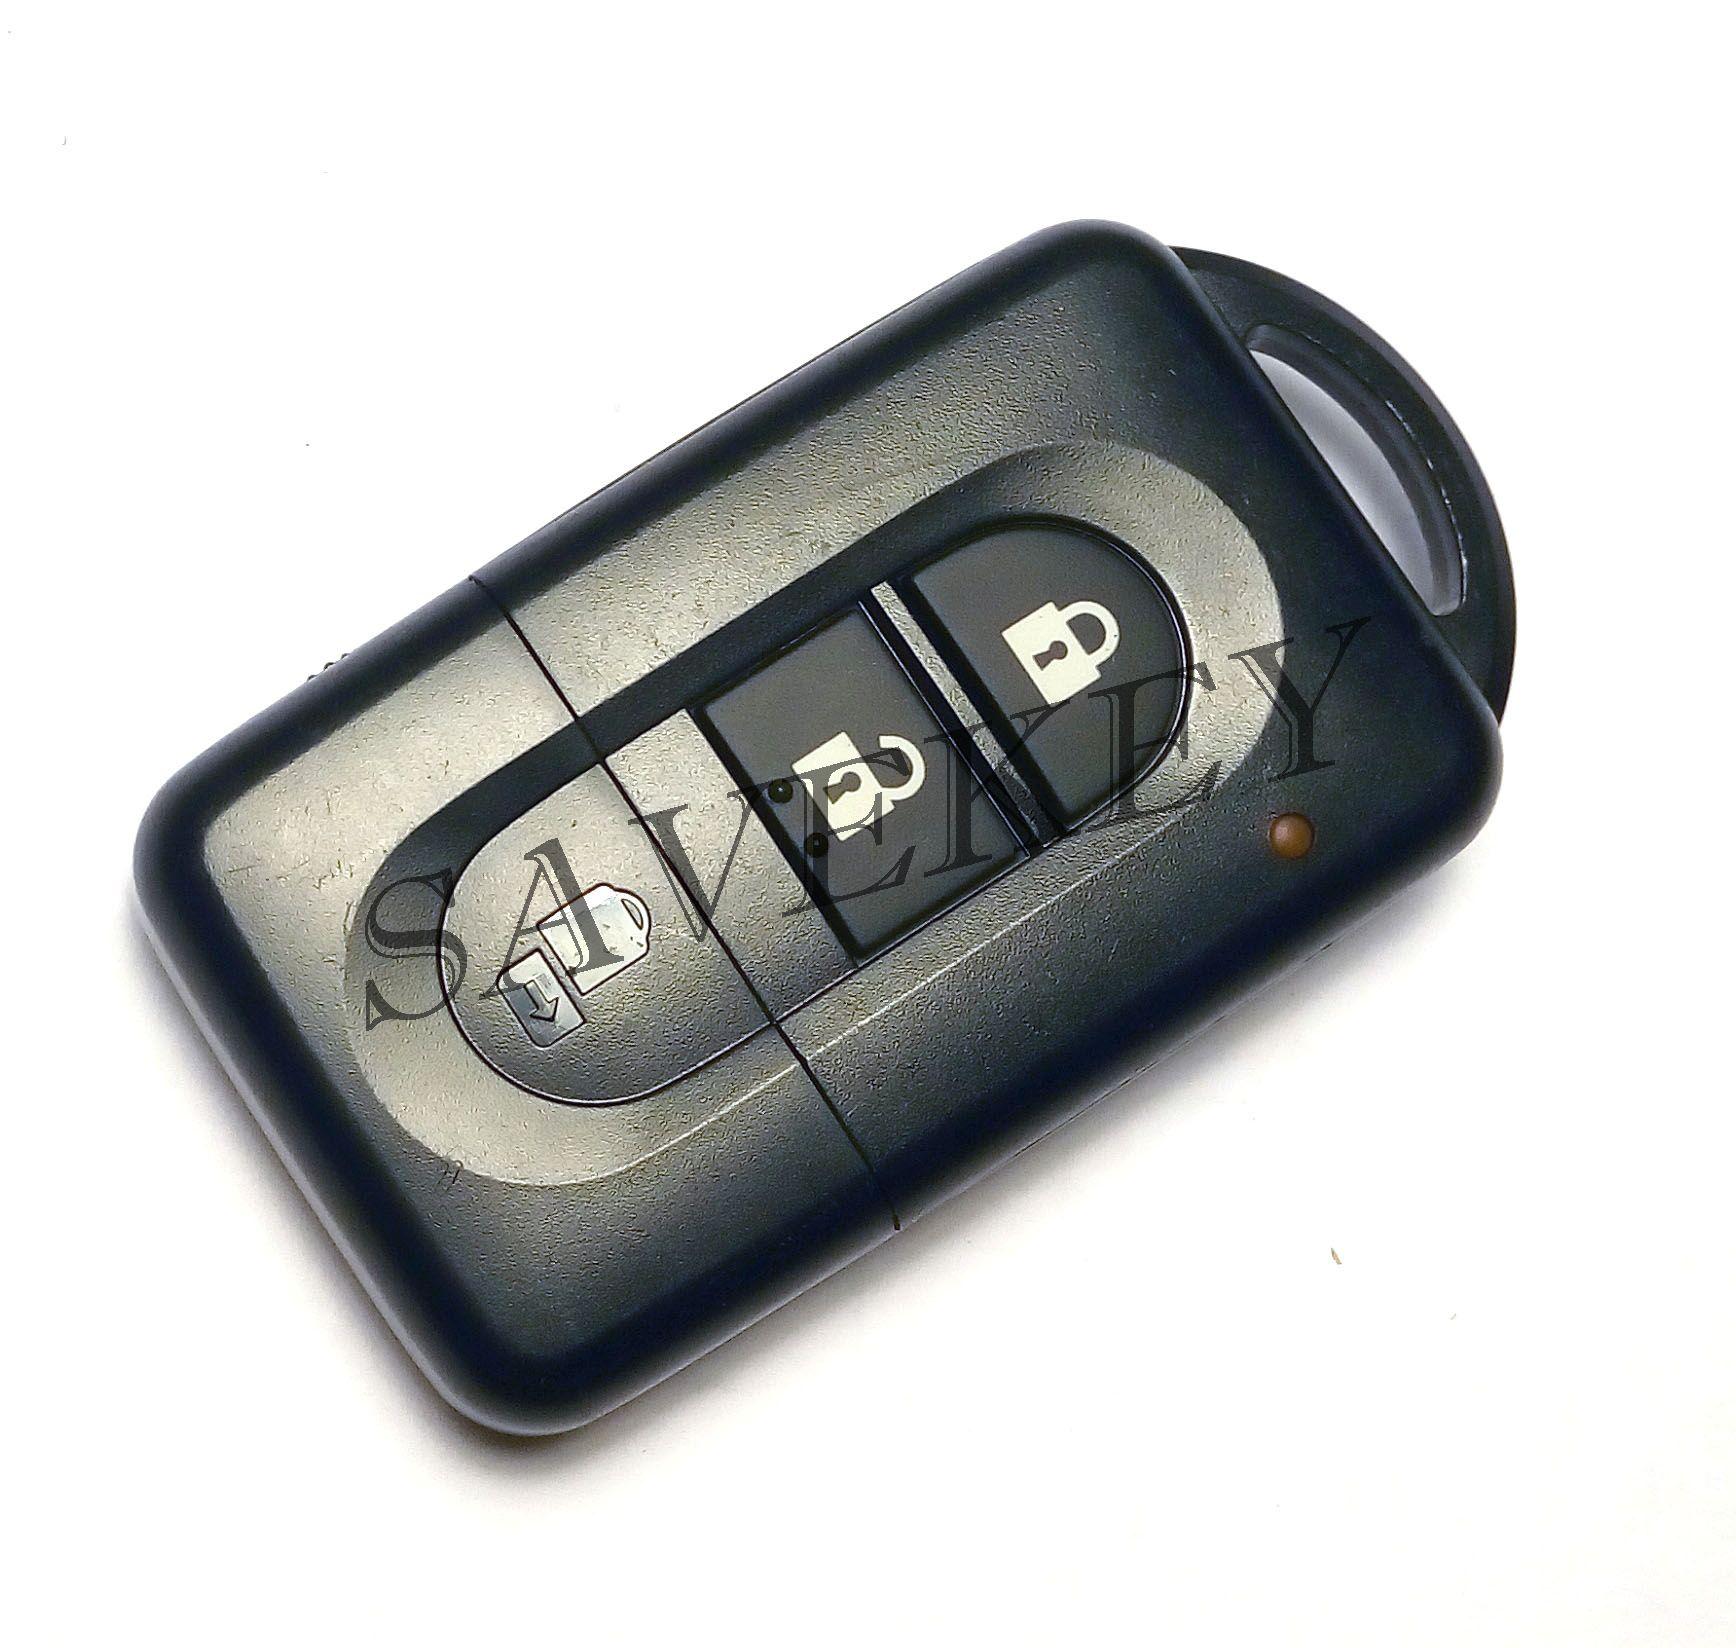 Смарт ключ Nissan для моделей Micra, Note, X-Trail, Tiida, Pathfinder